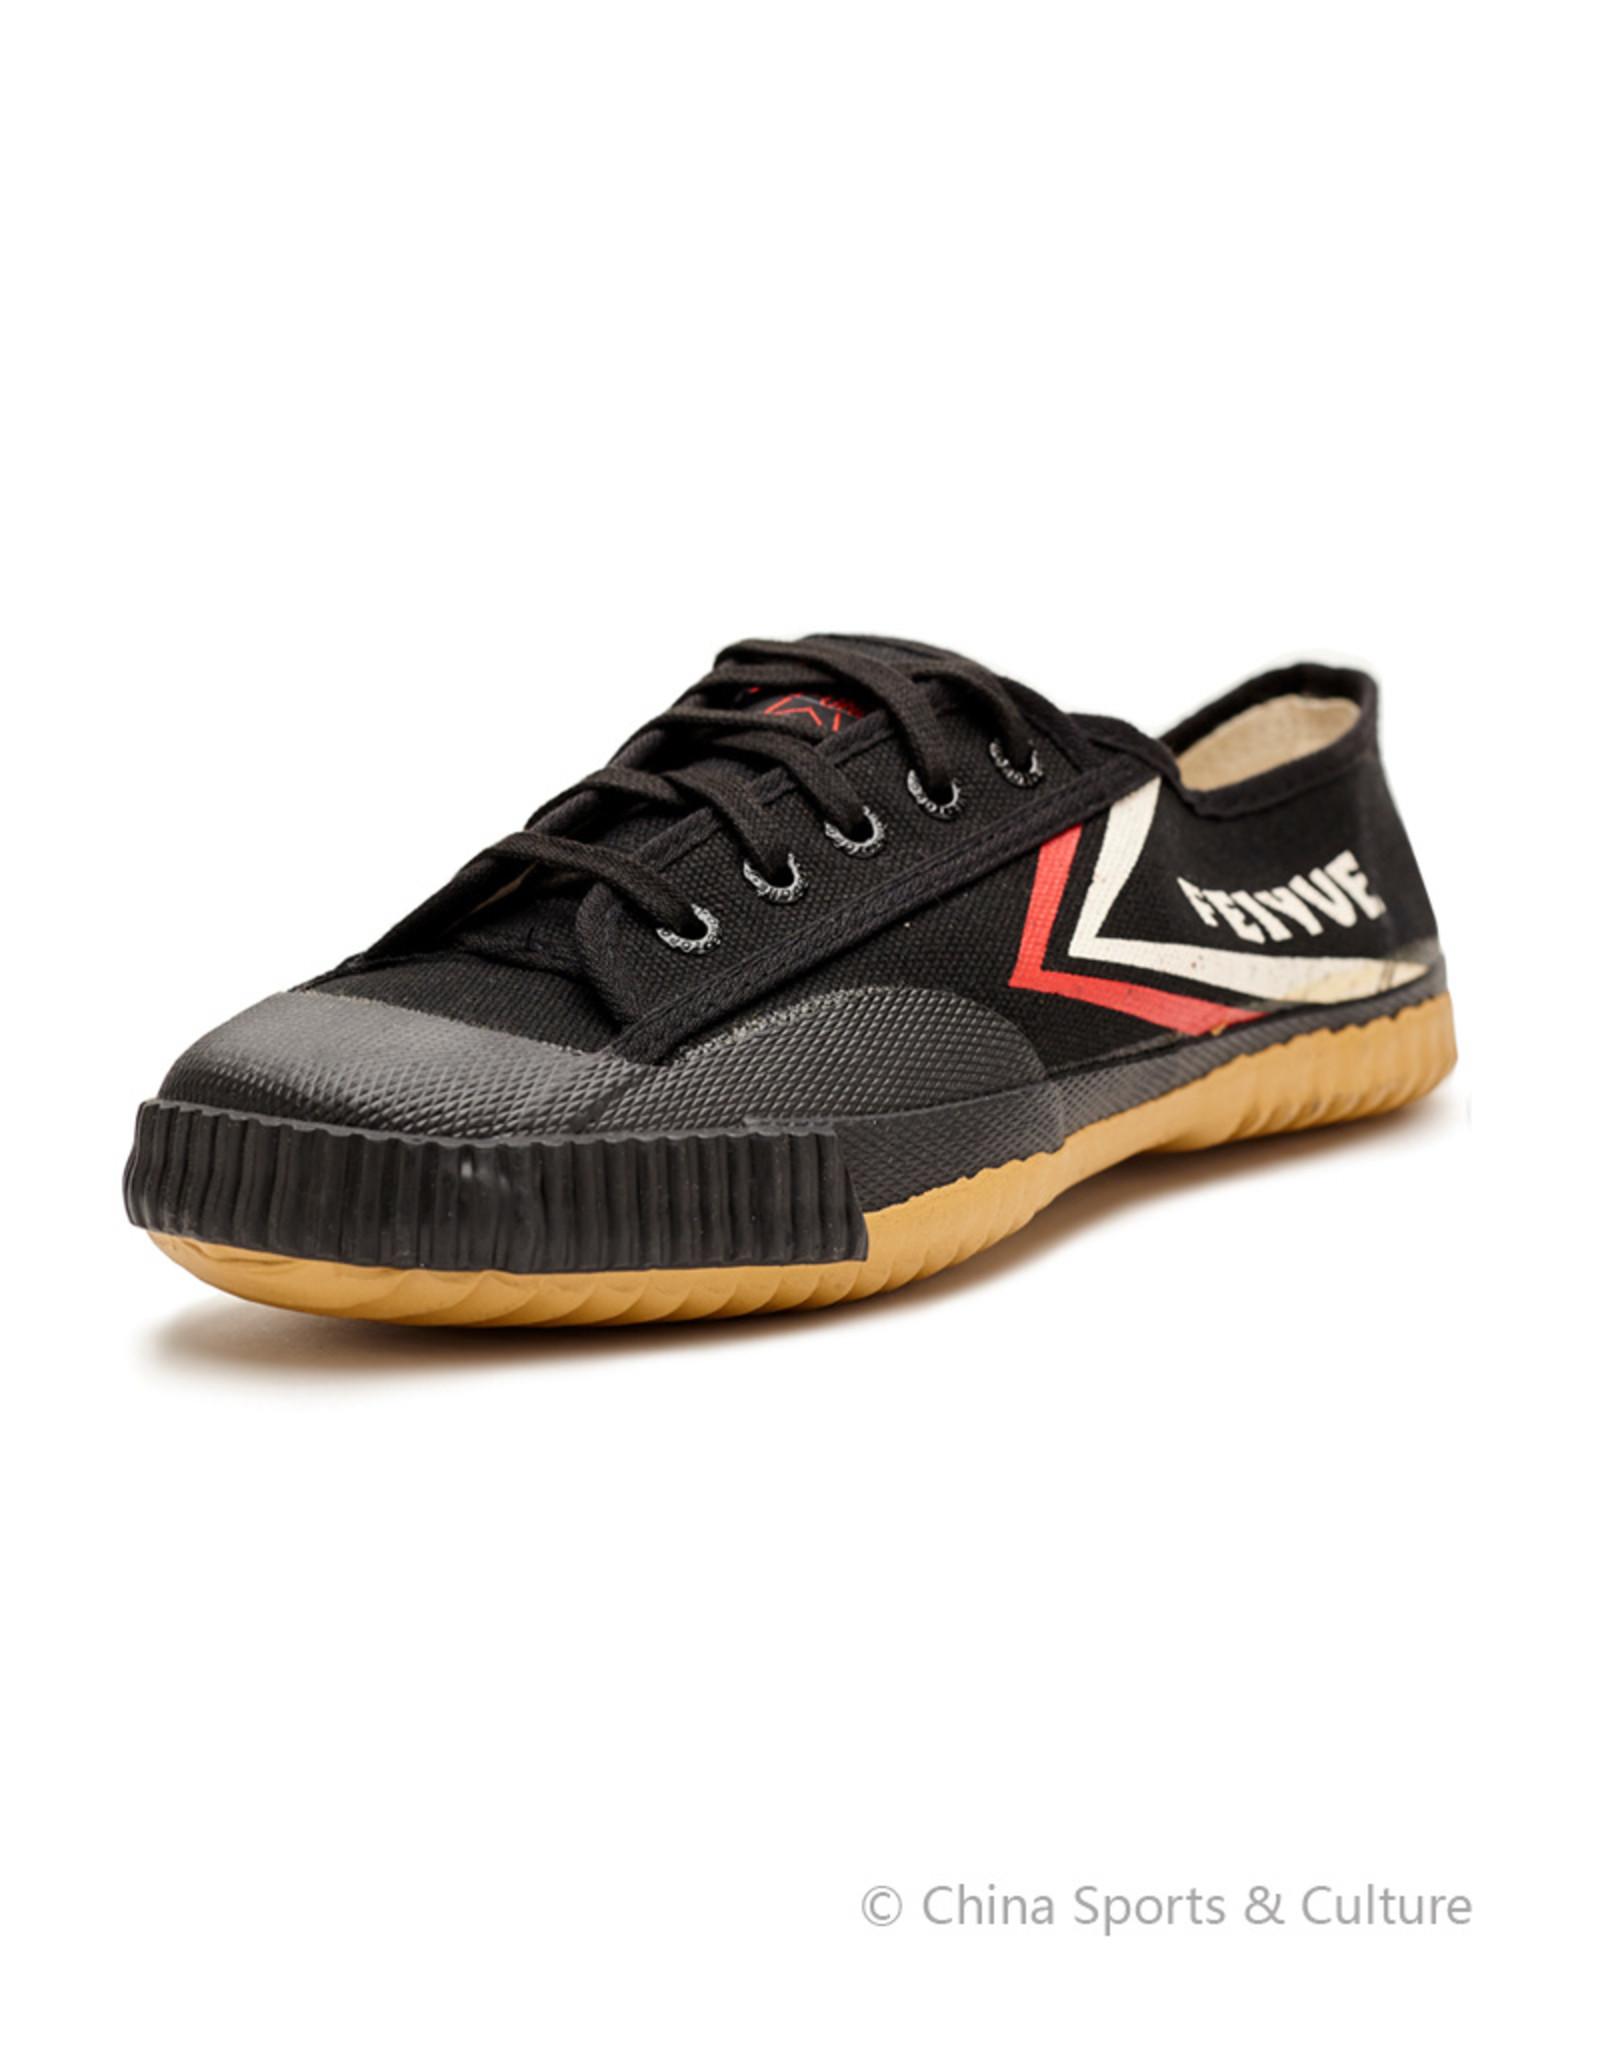 Feiyue Schoenen - Zwart